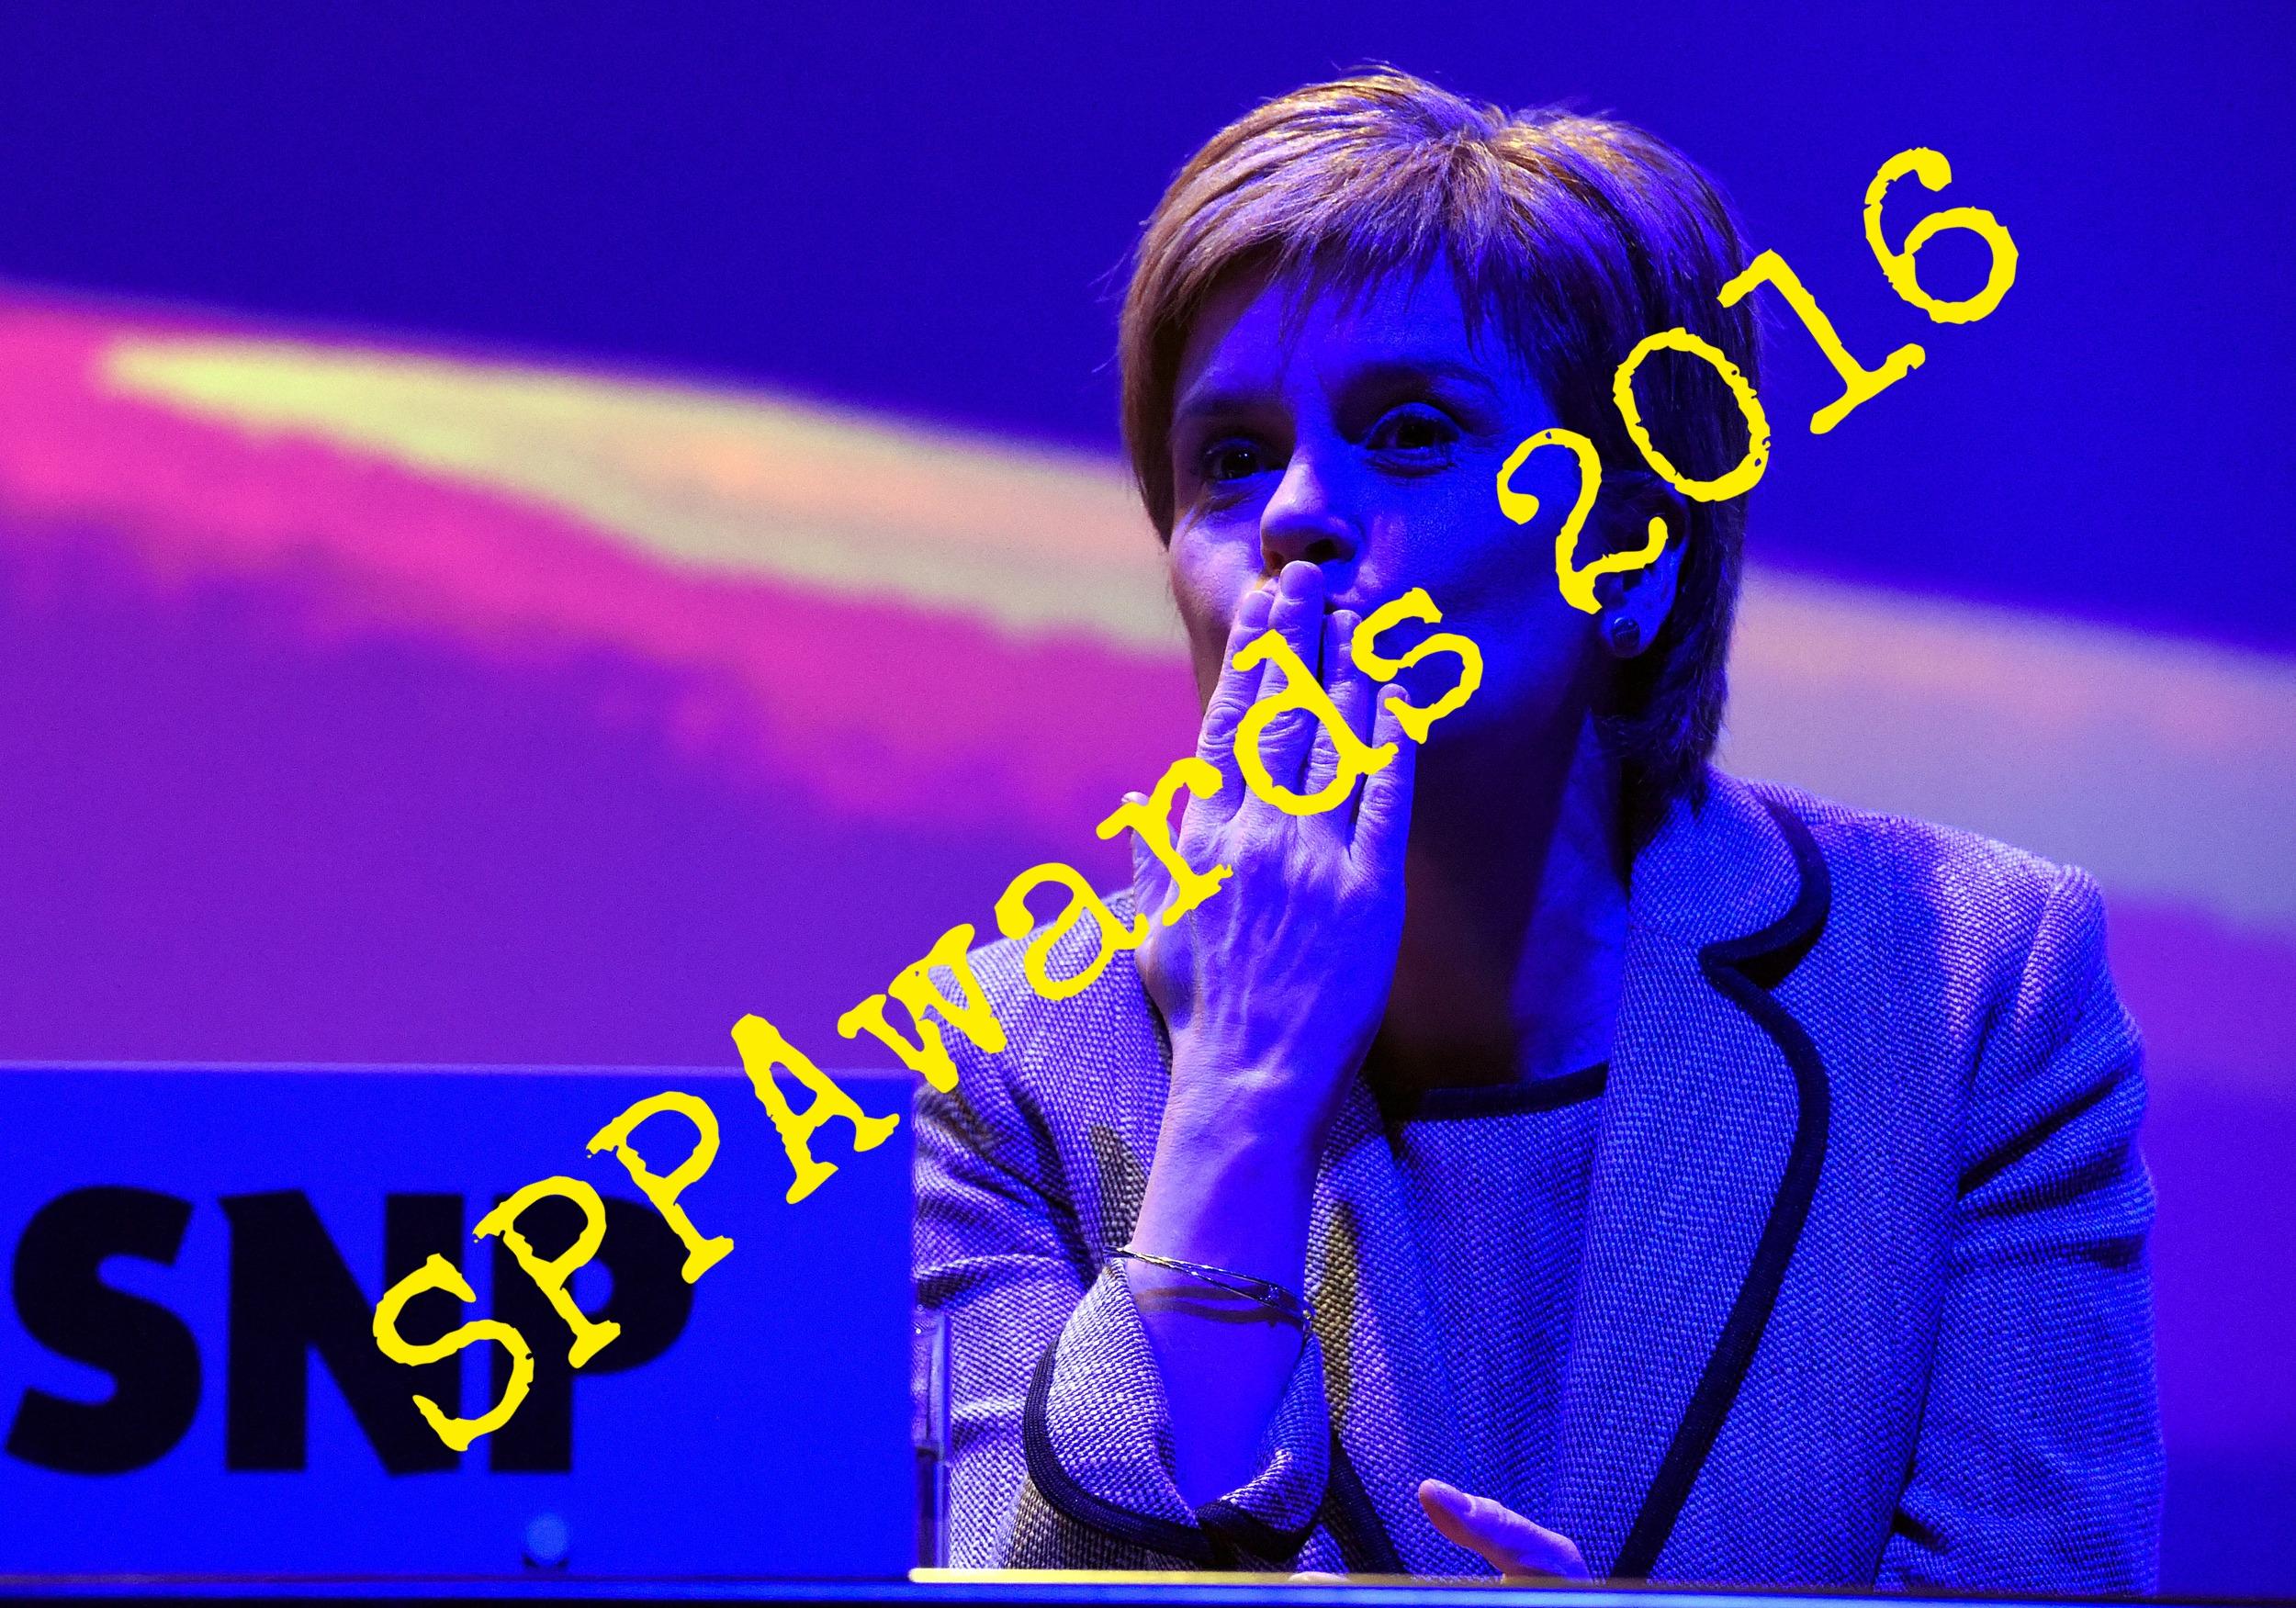 Love the SNP.jpg